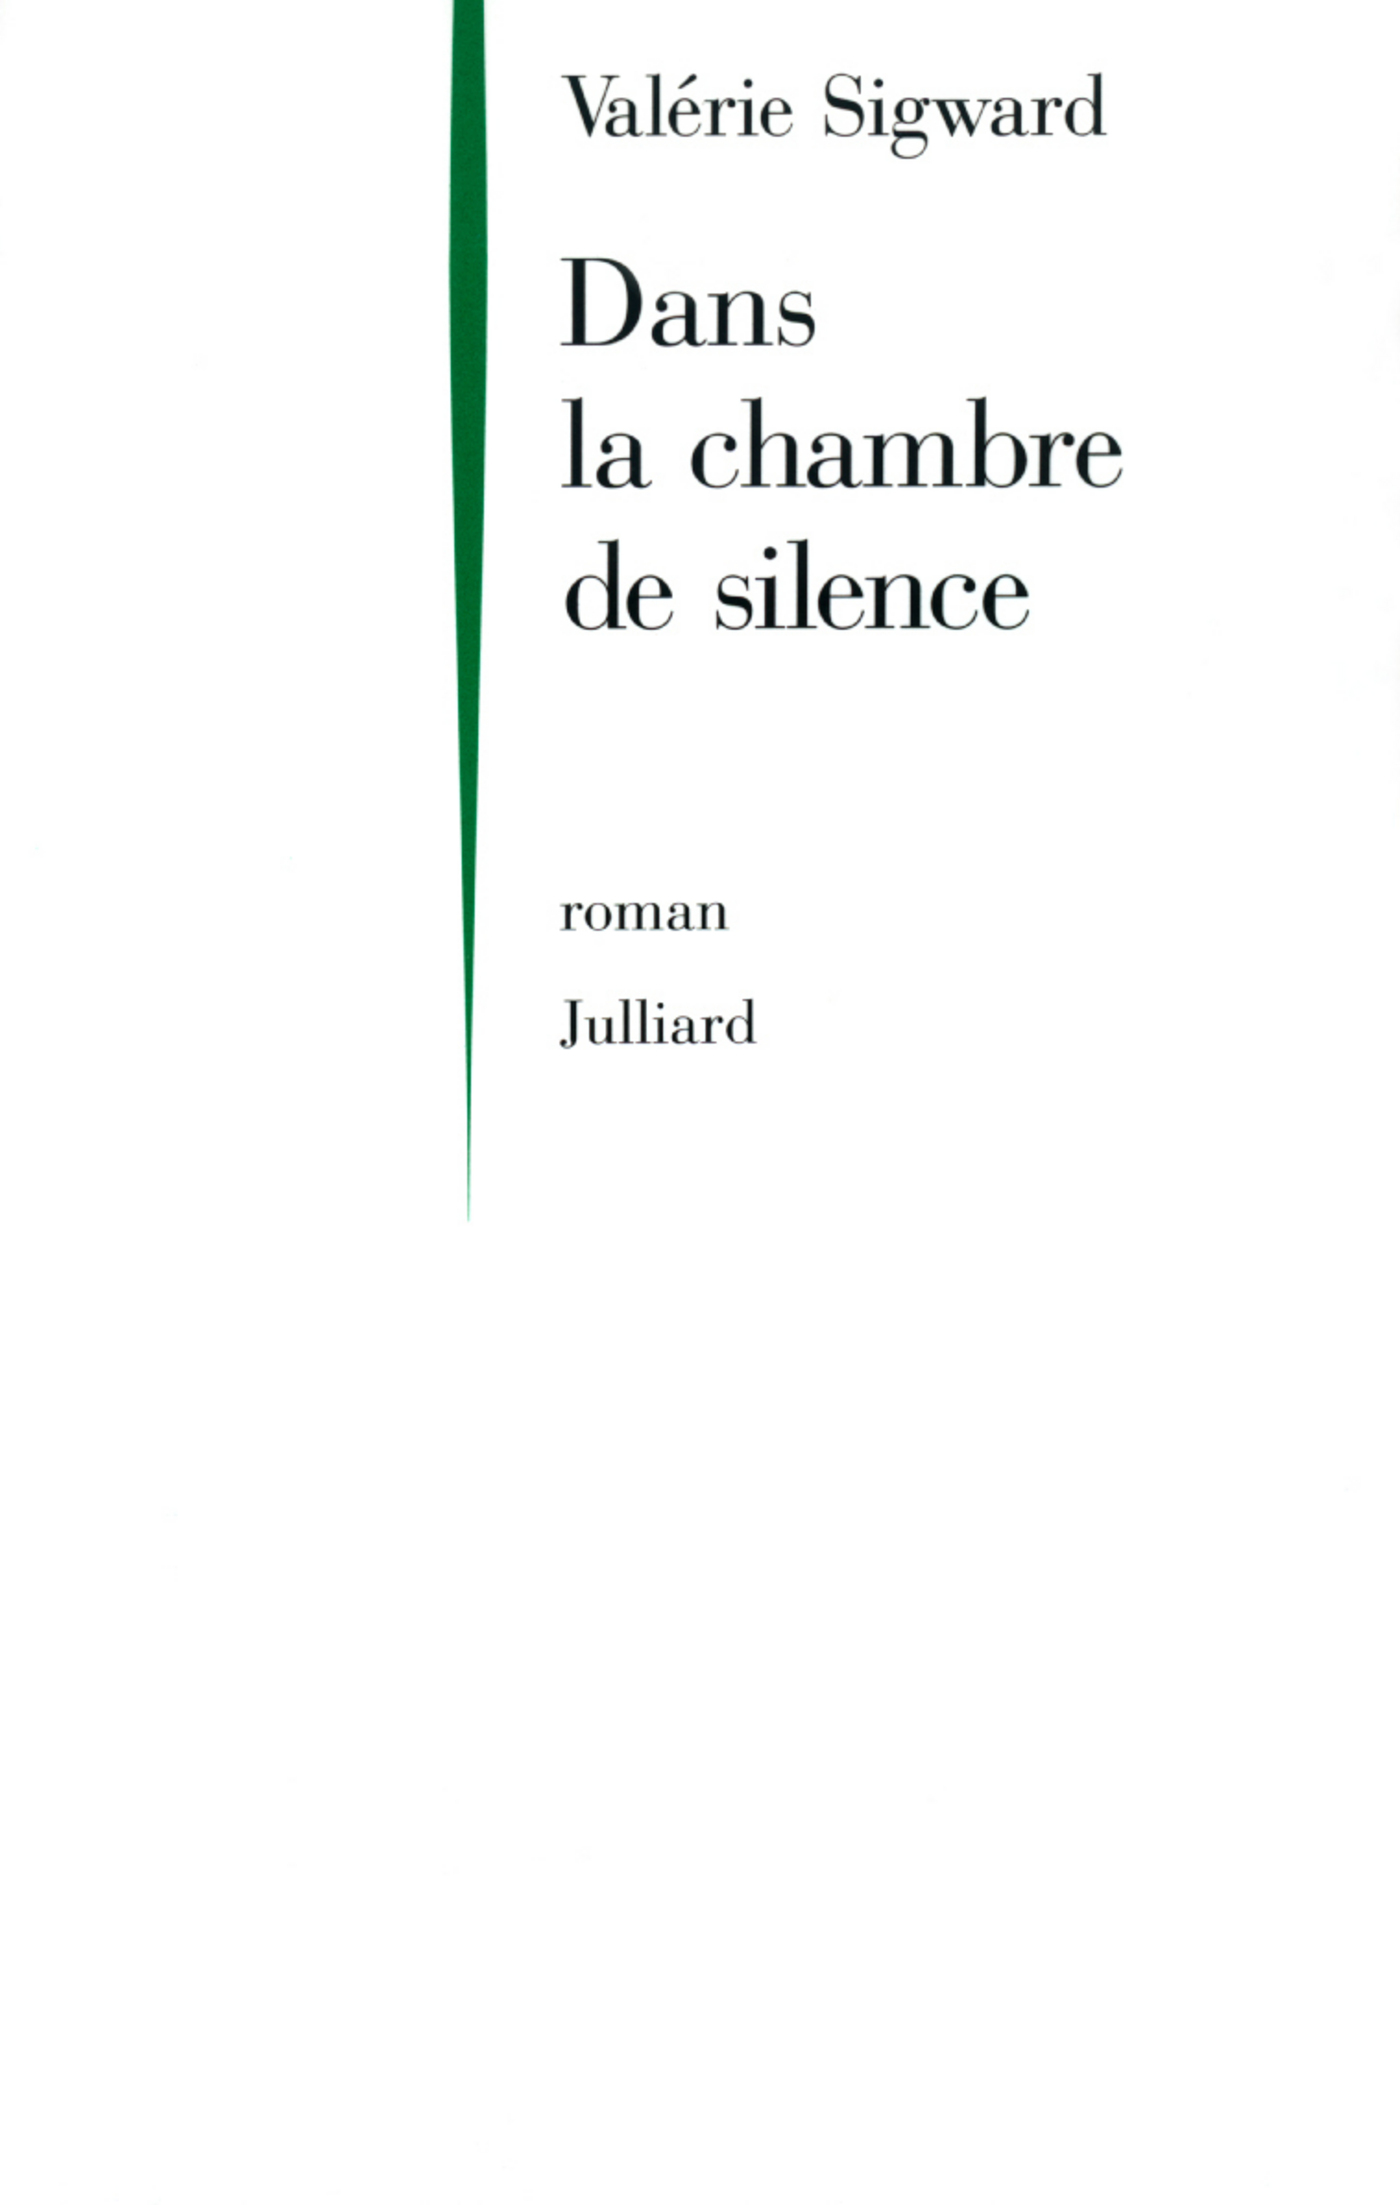 Dans la chambre de silence (ebook)